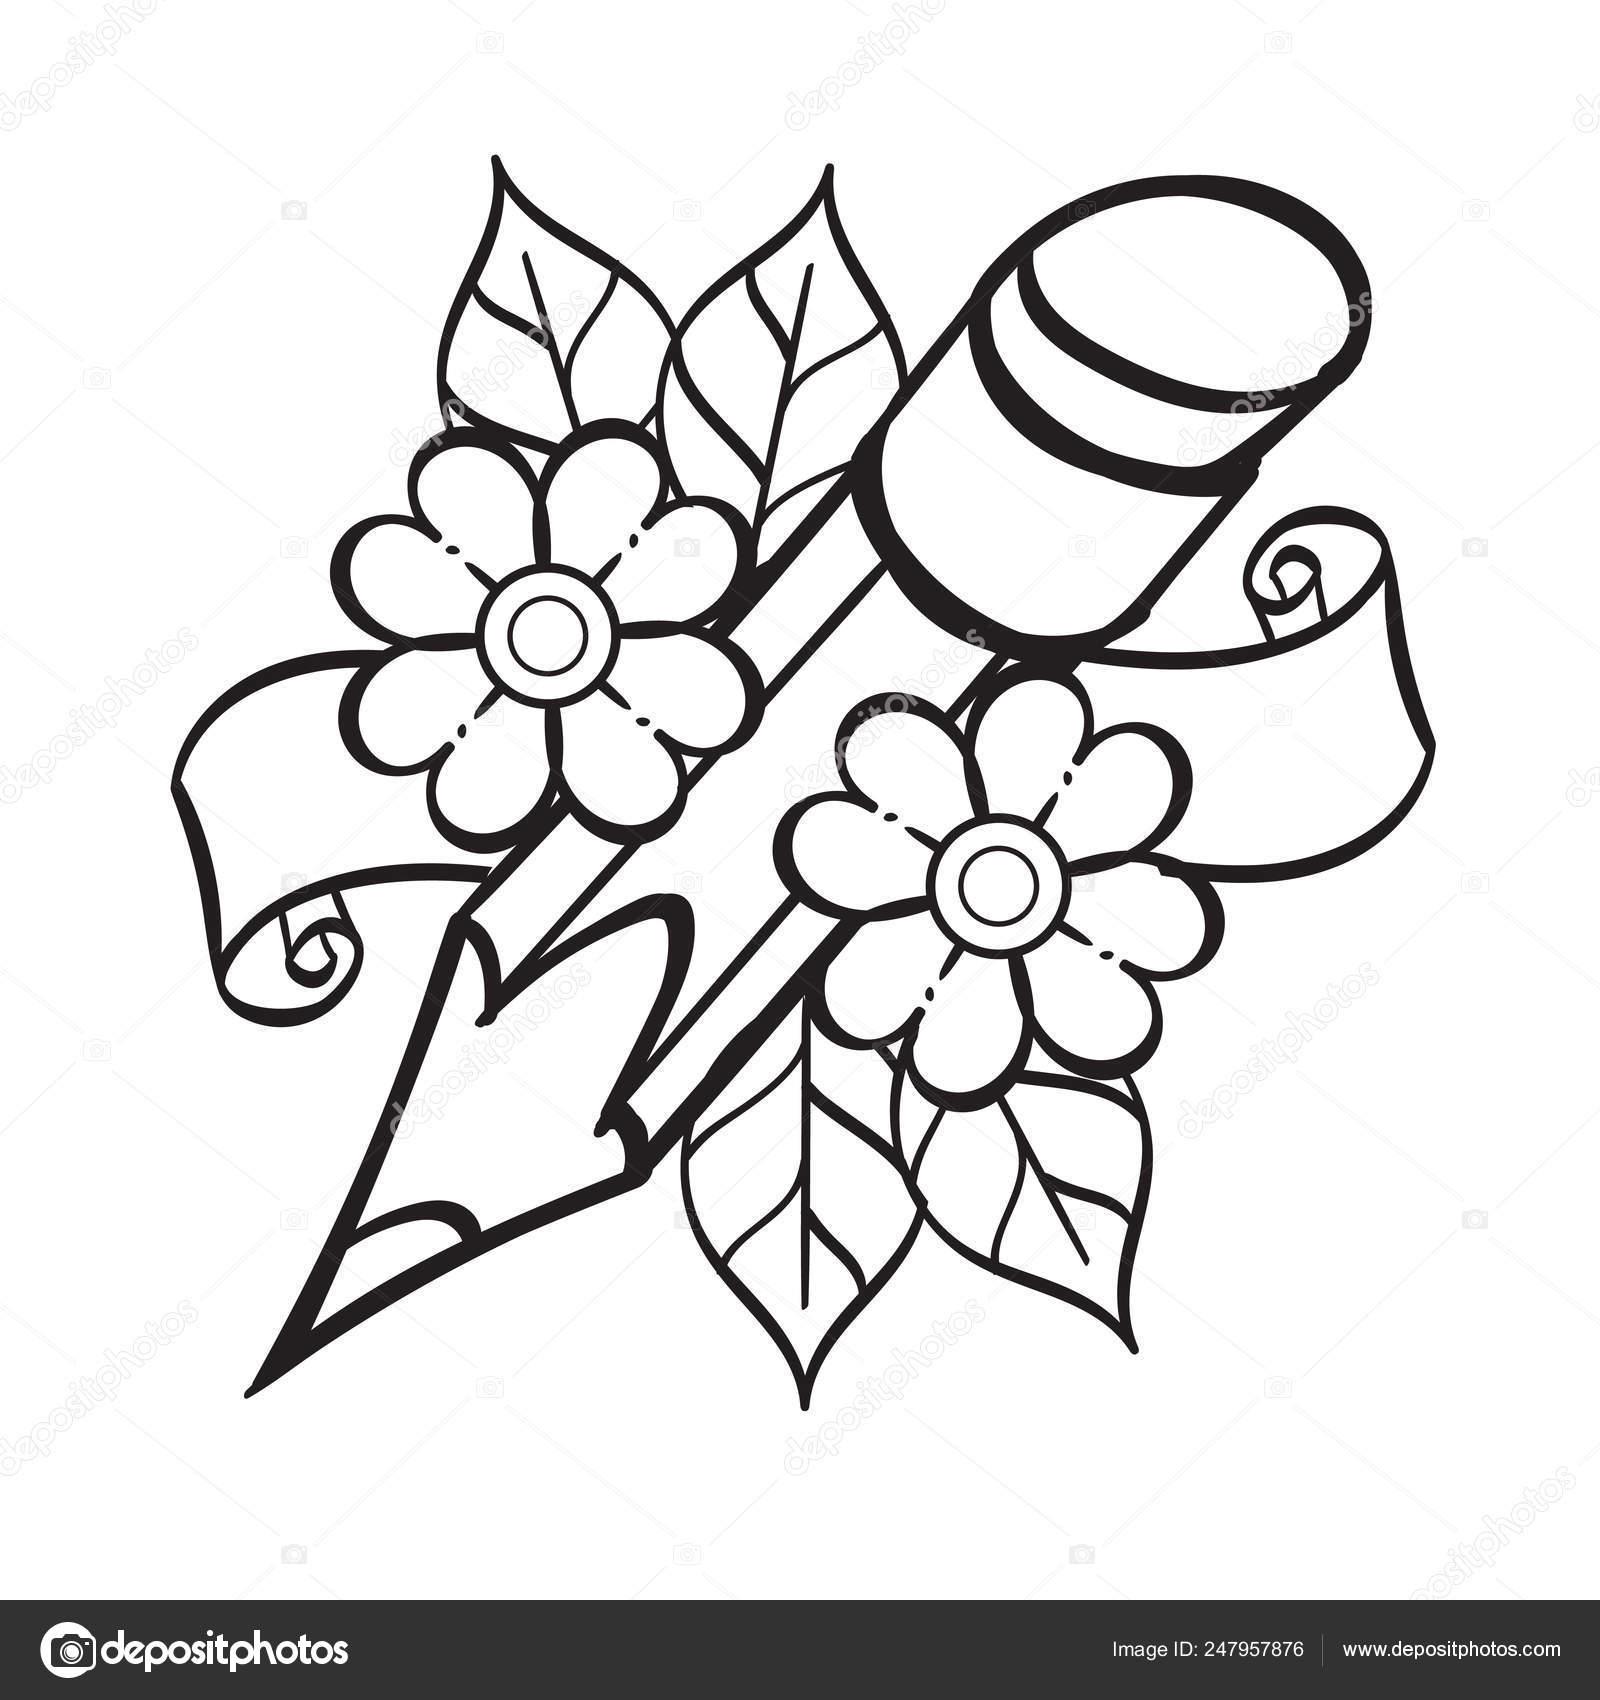 Dibujo De Lápiz Para Colorear Plantilla Para Tatuaje